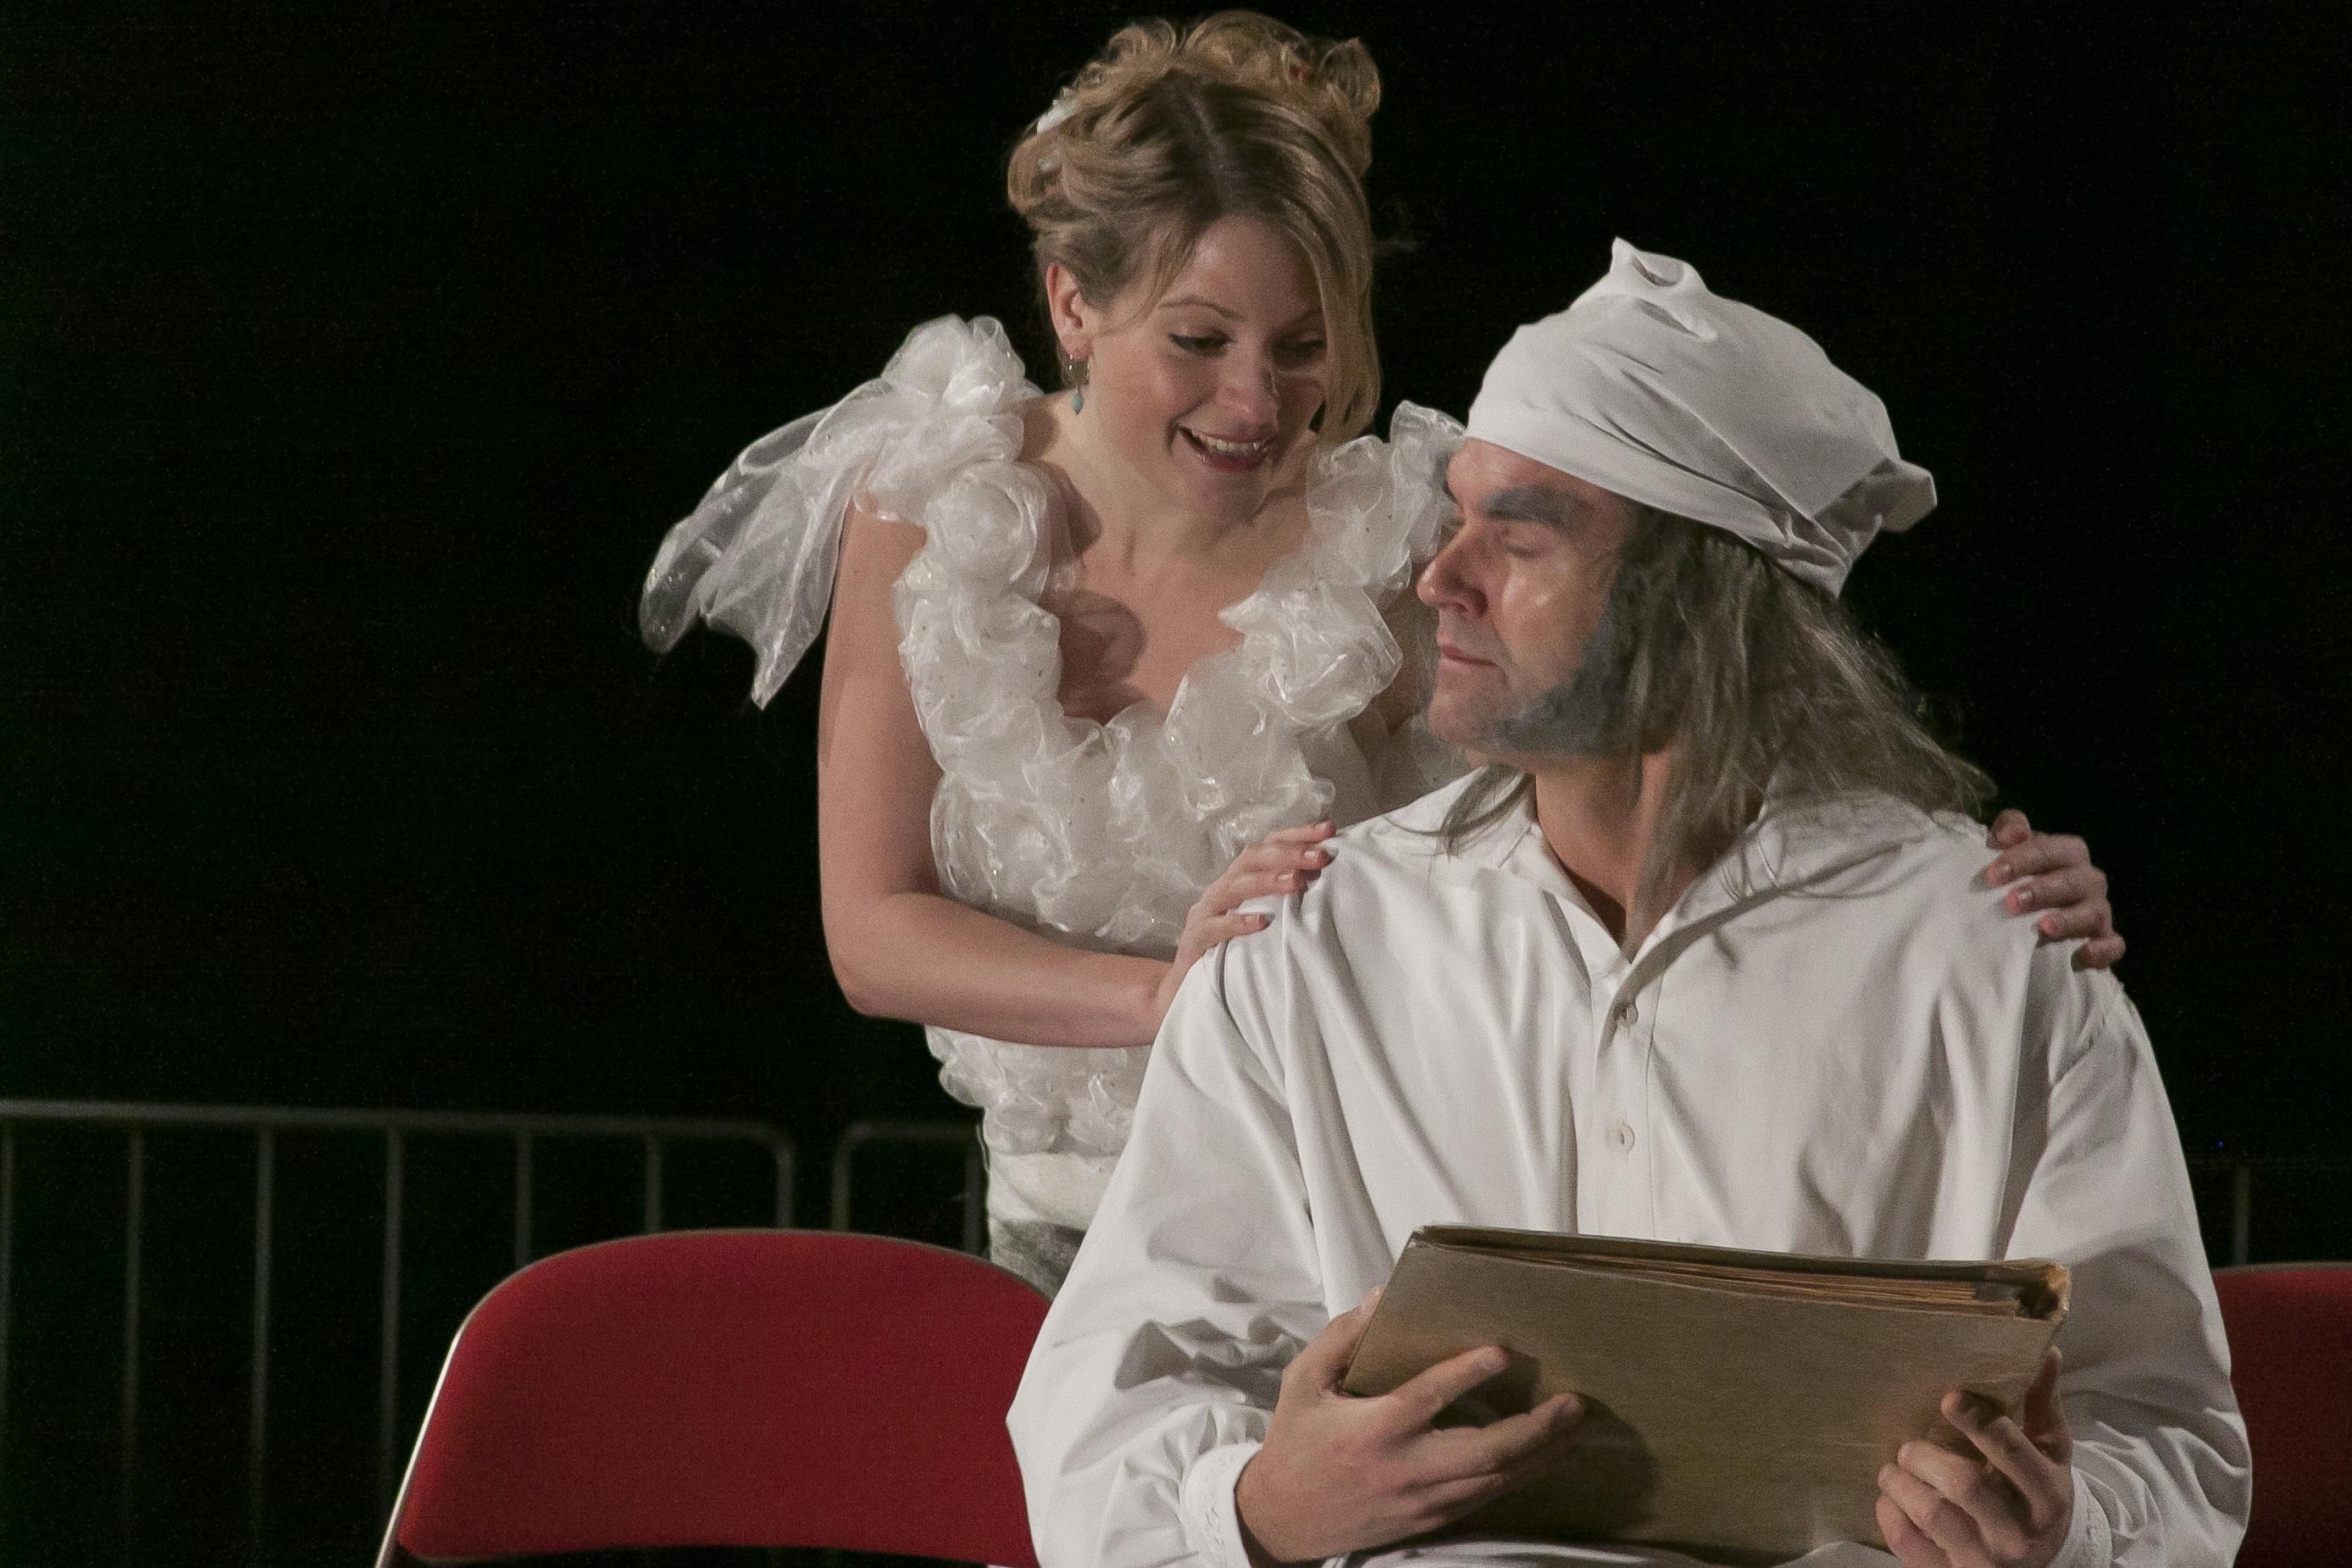 Et Juleeventyr-- Scrooge og Den forgangne juls ånd. Peter Jorde og Maja Muhlack.Foto Visti Petersen13[2]